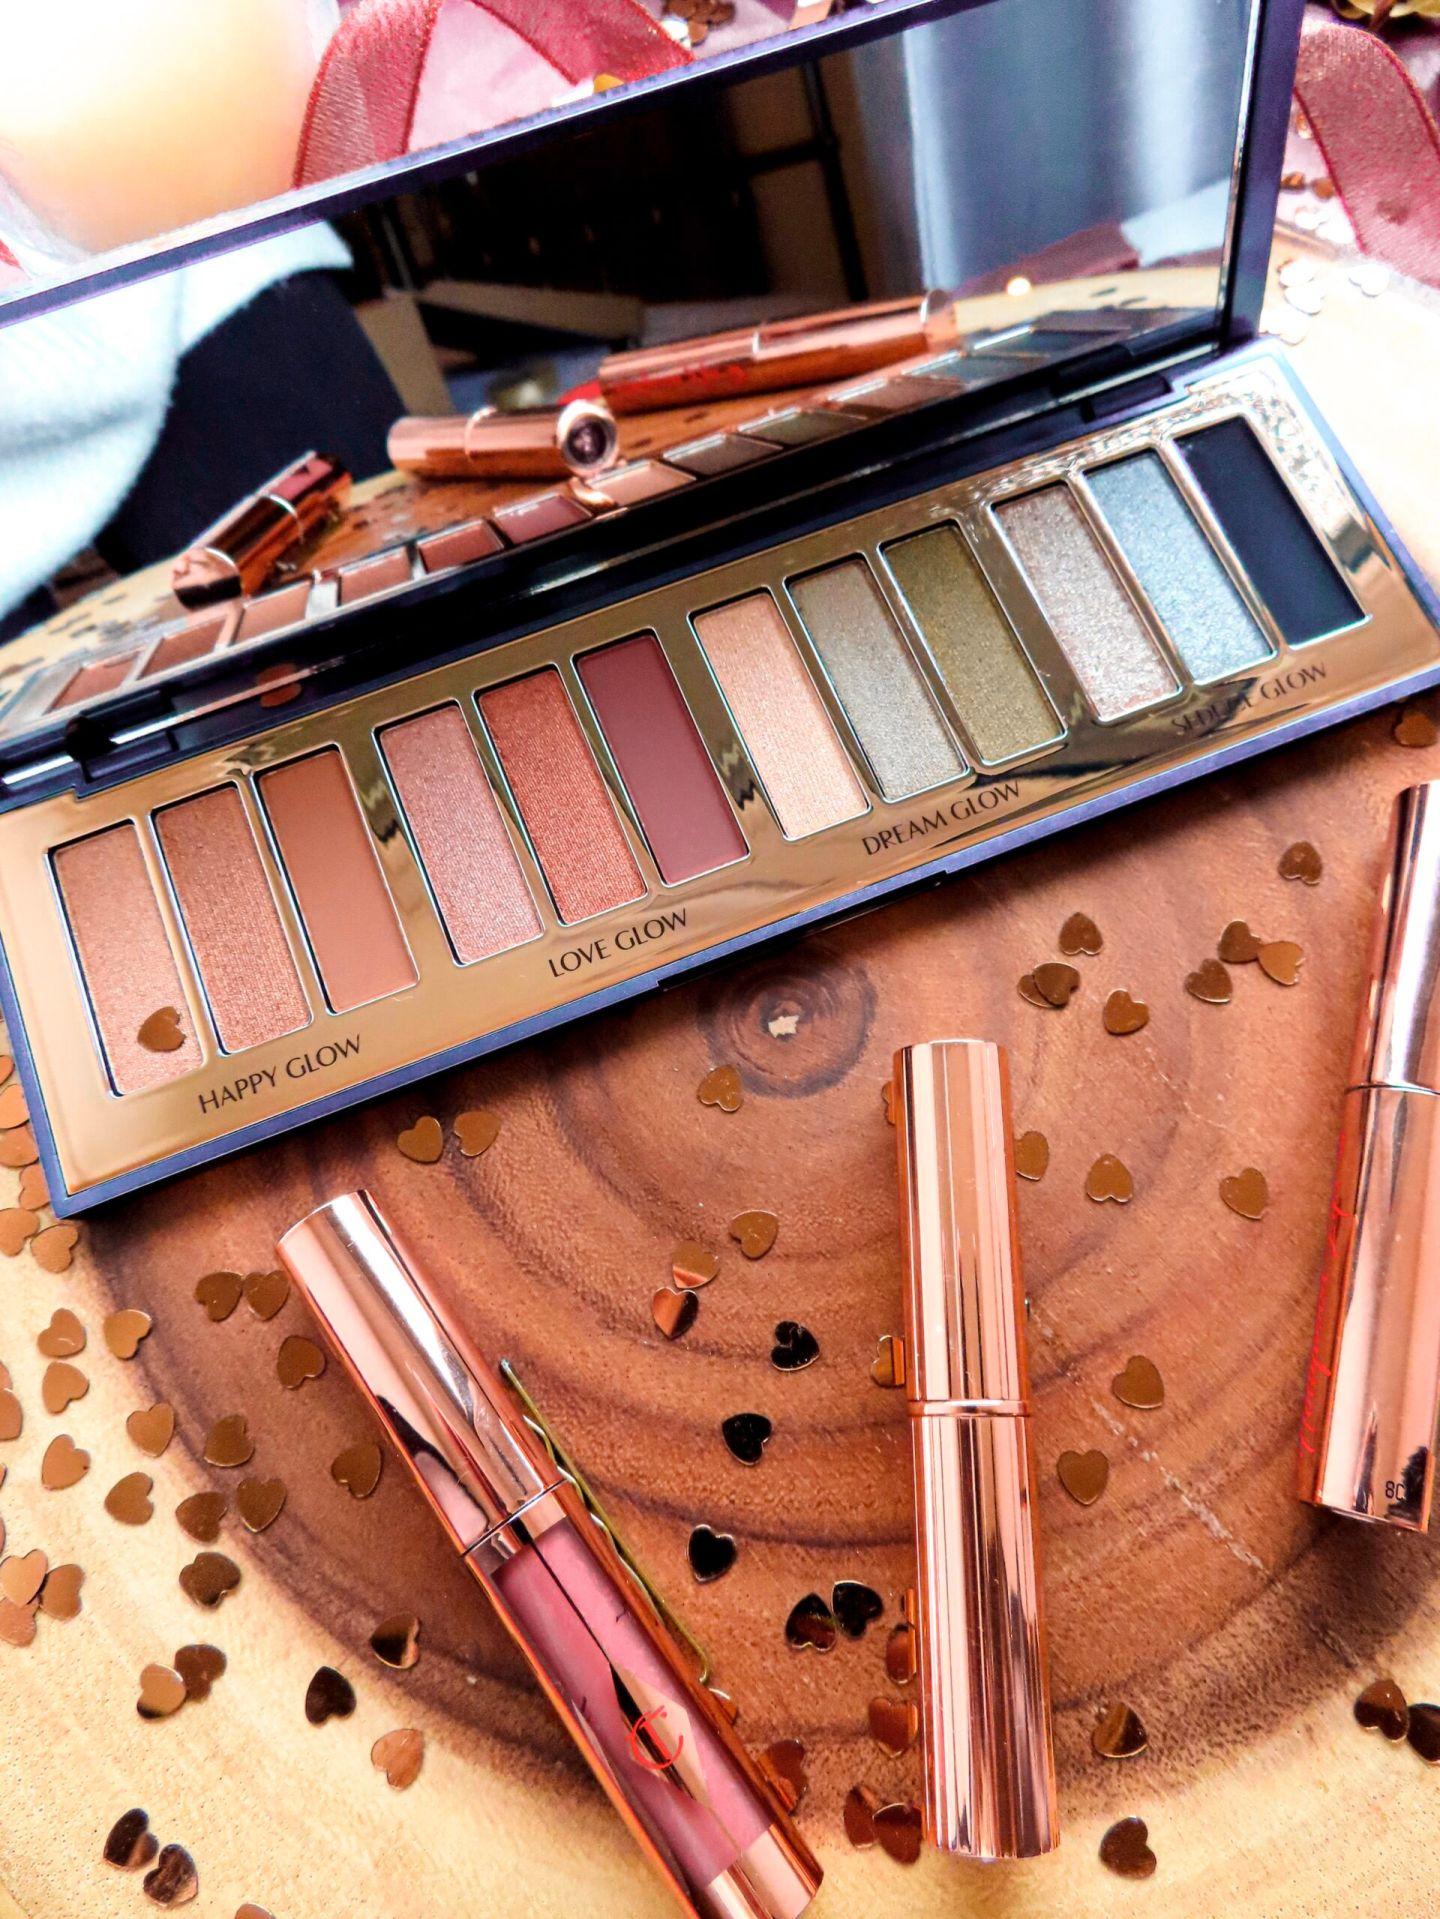 Charlotte Tilbury Eyeshadow Palette